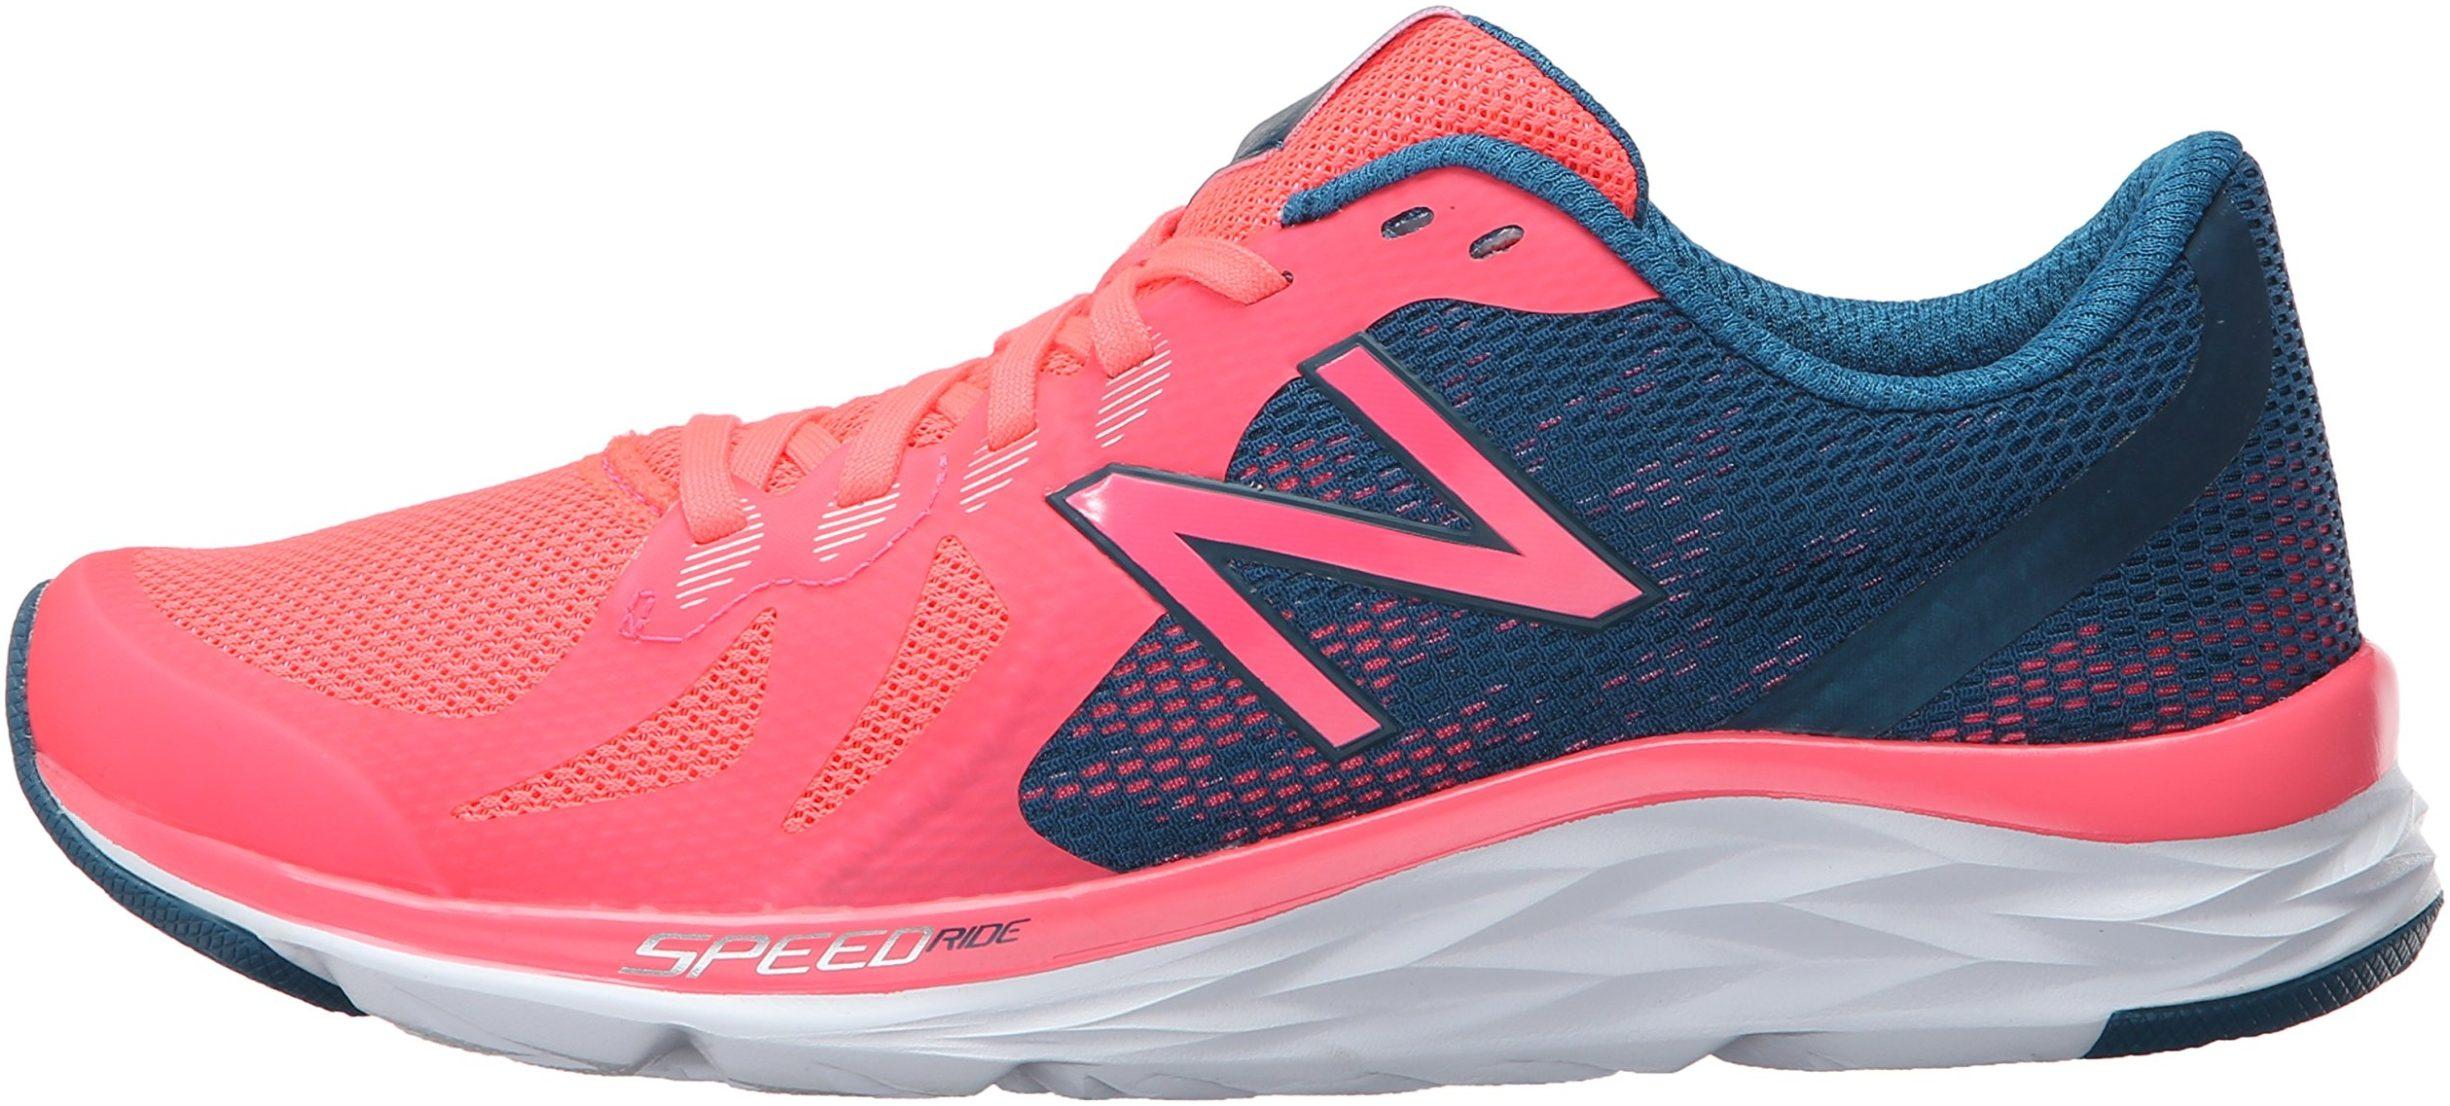 New Balance 790 v6